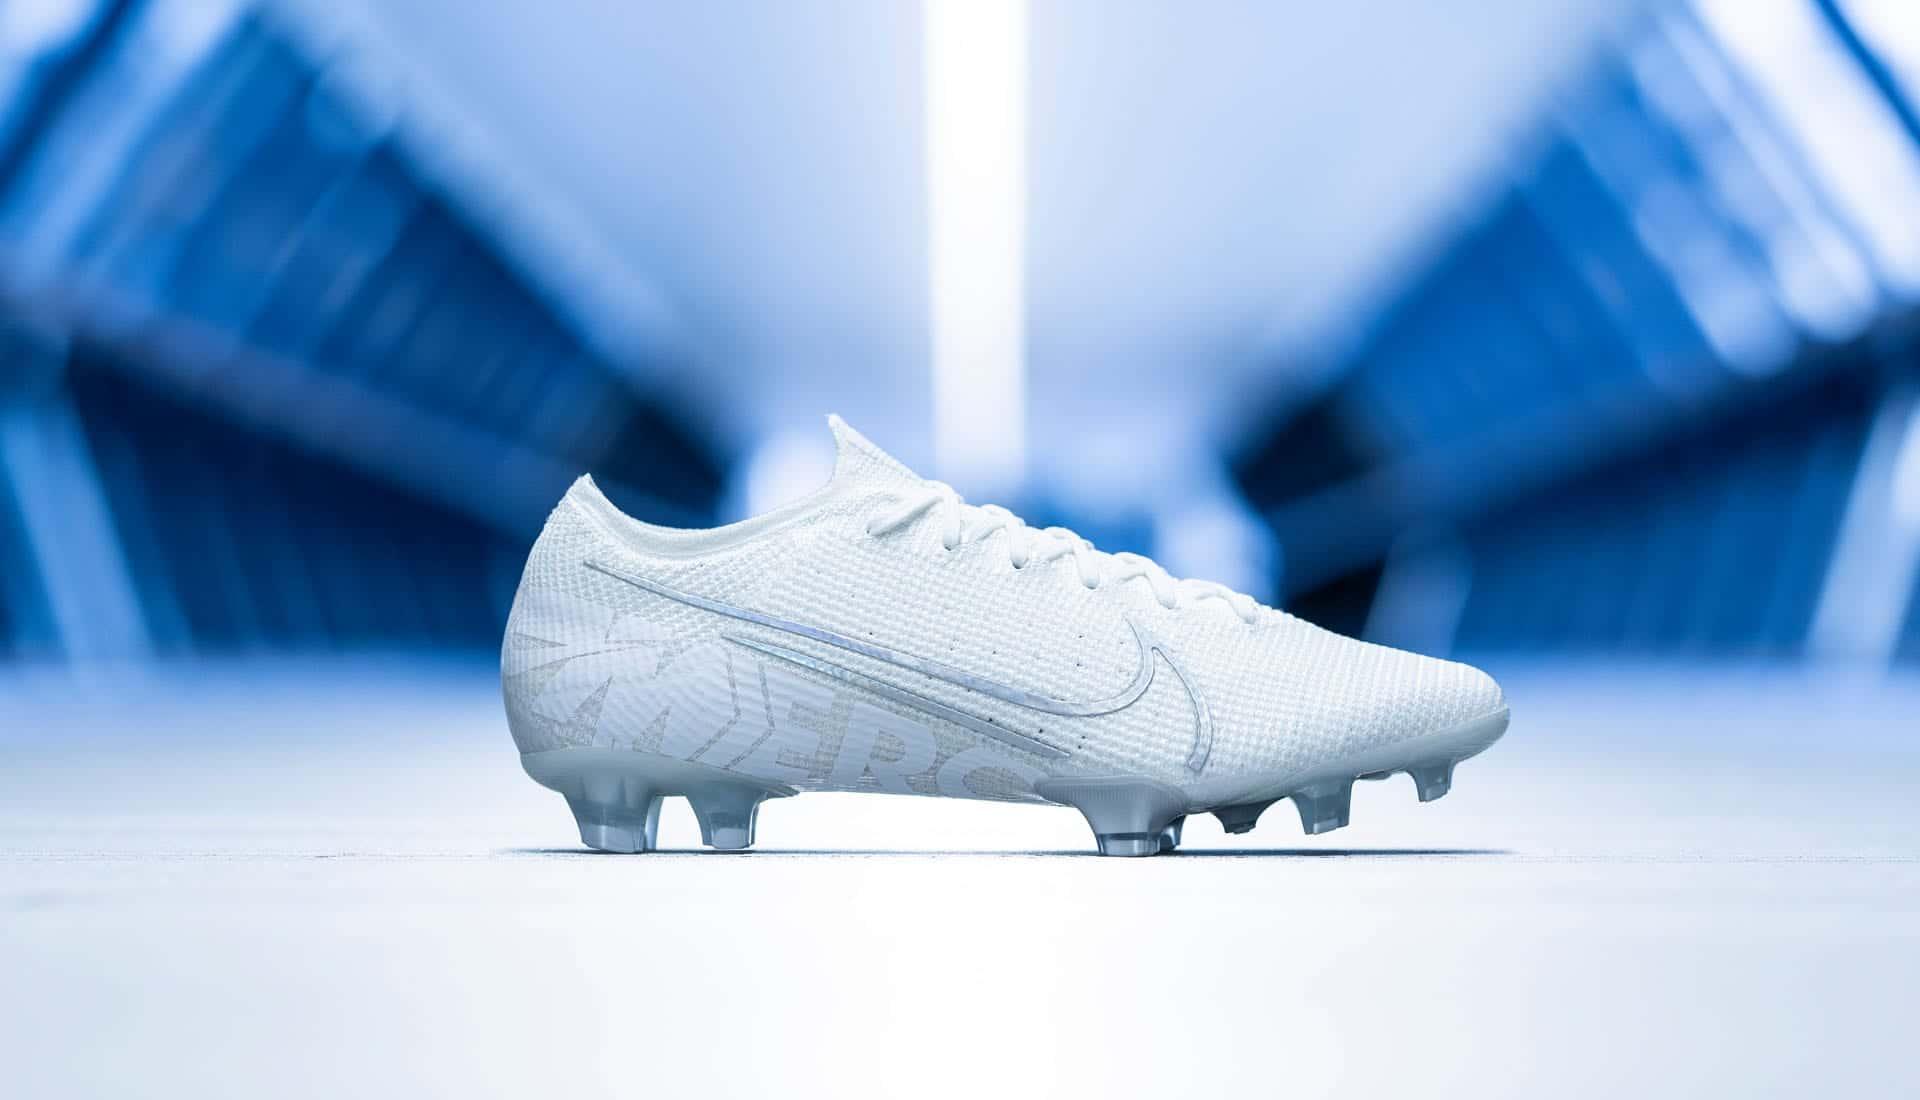 Giày bóng đá Nike Nuovo White pack Vapor 13 Elite FG